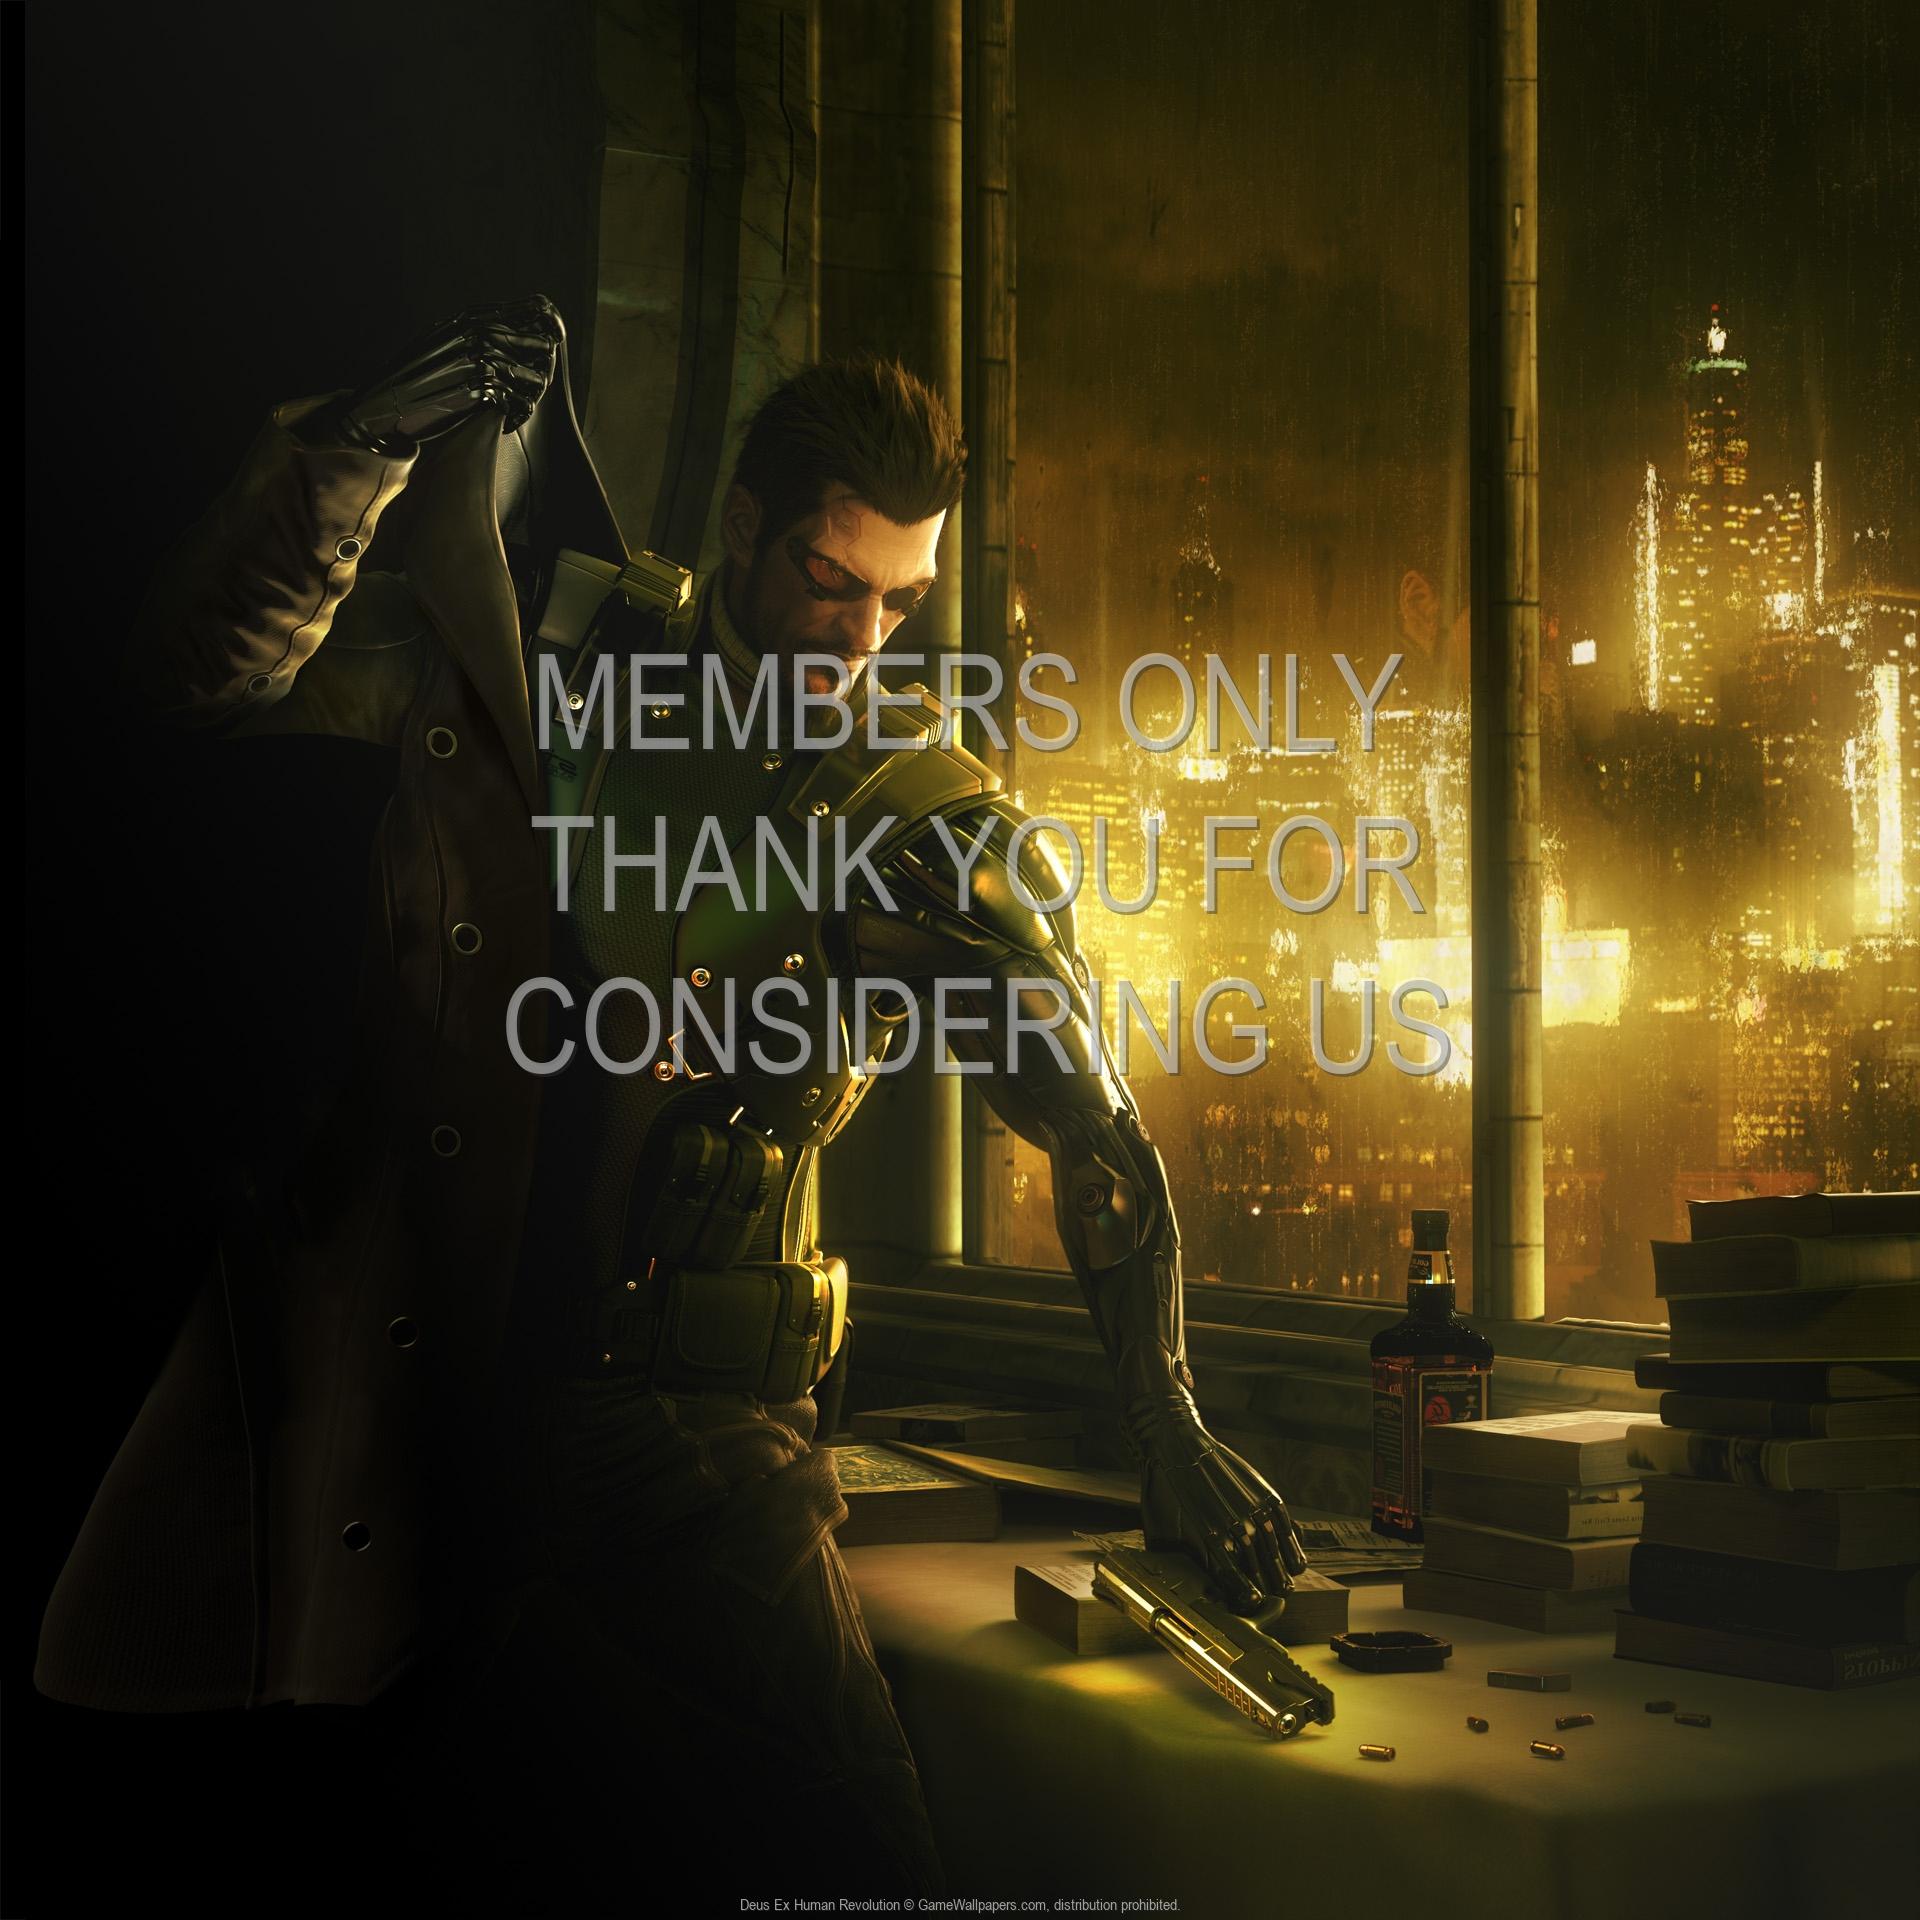 Deus Ex: Human Revolution 1920x1080 Handy Hintergrundbild 05